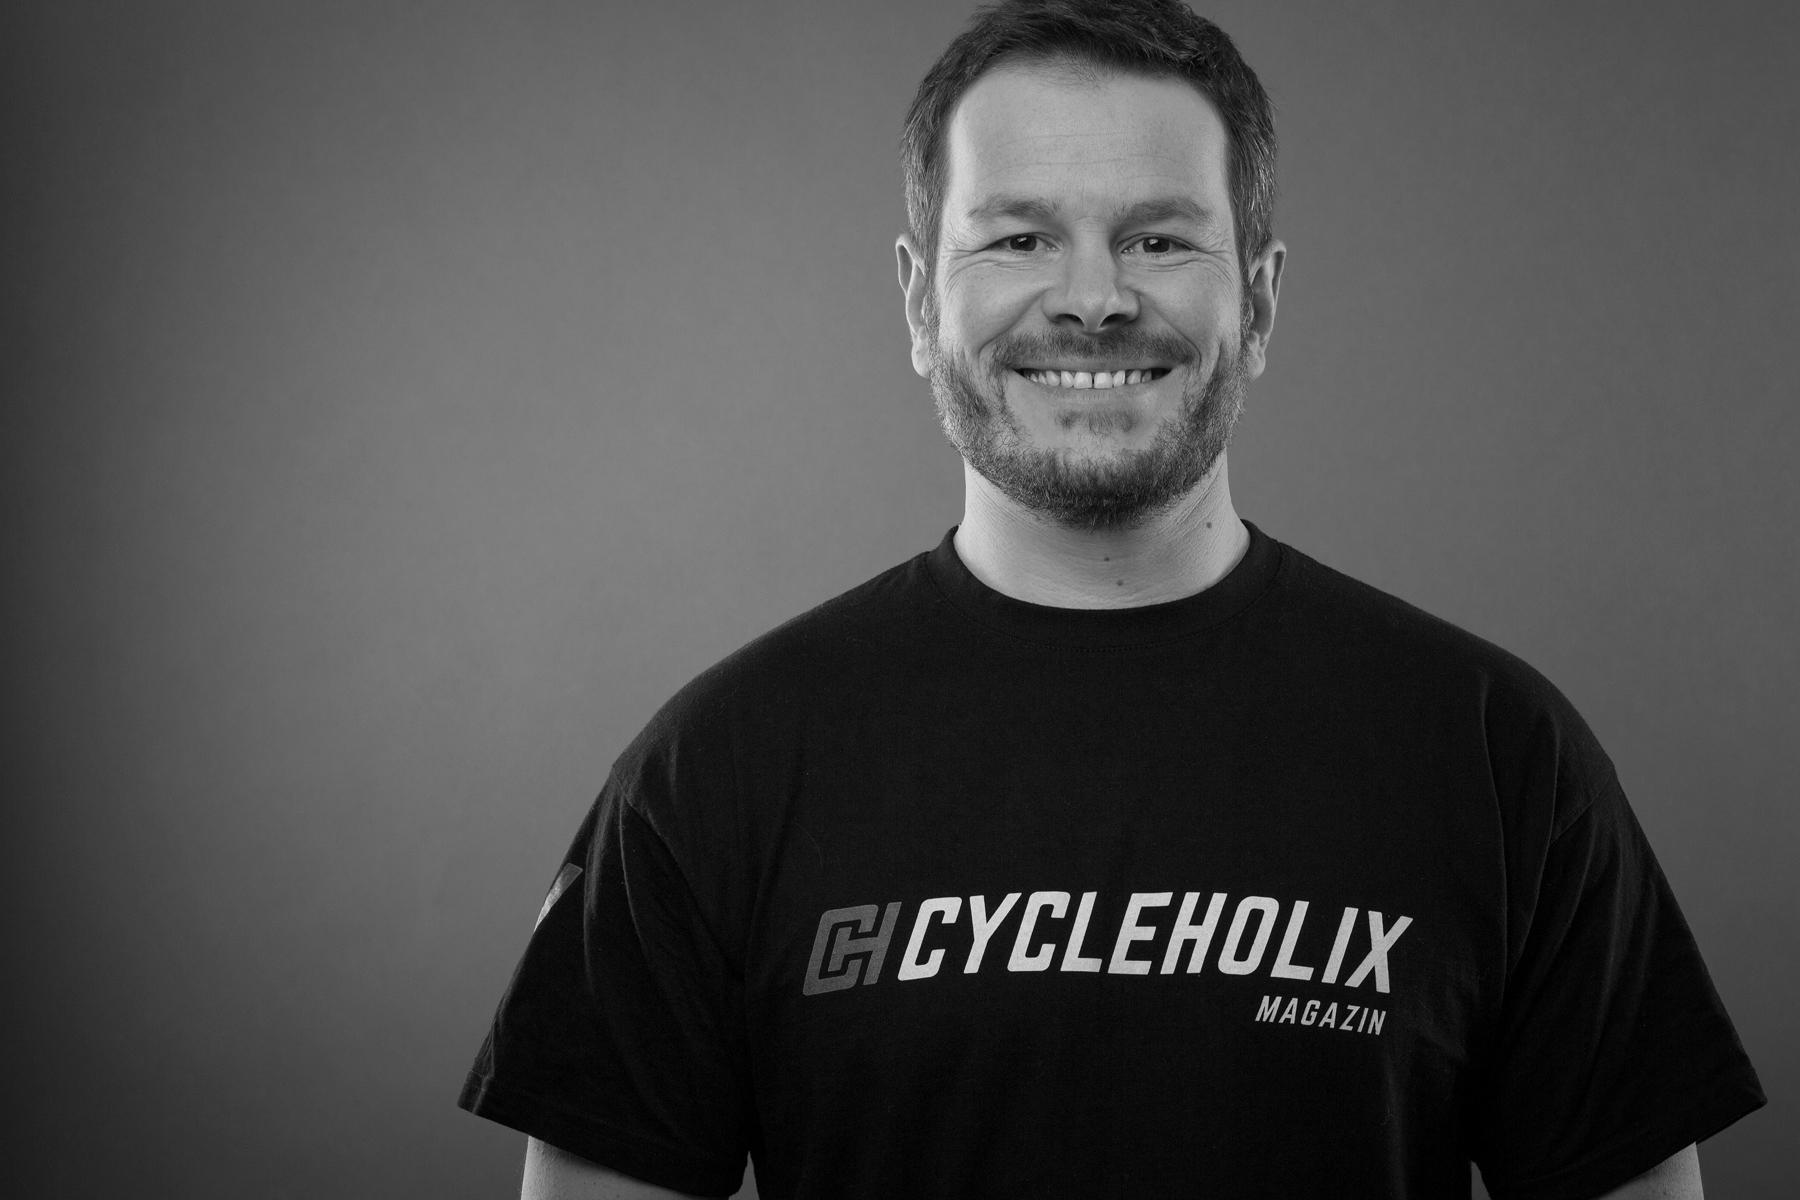 06 Cycleholix